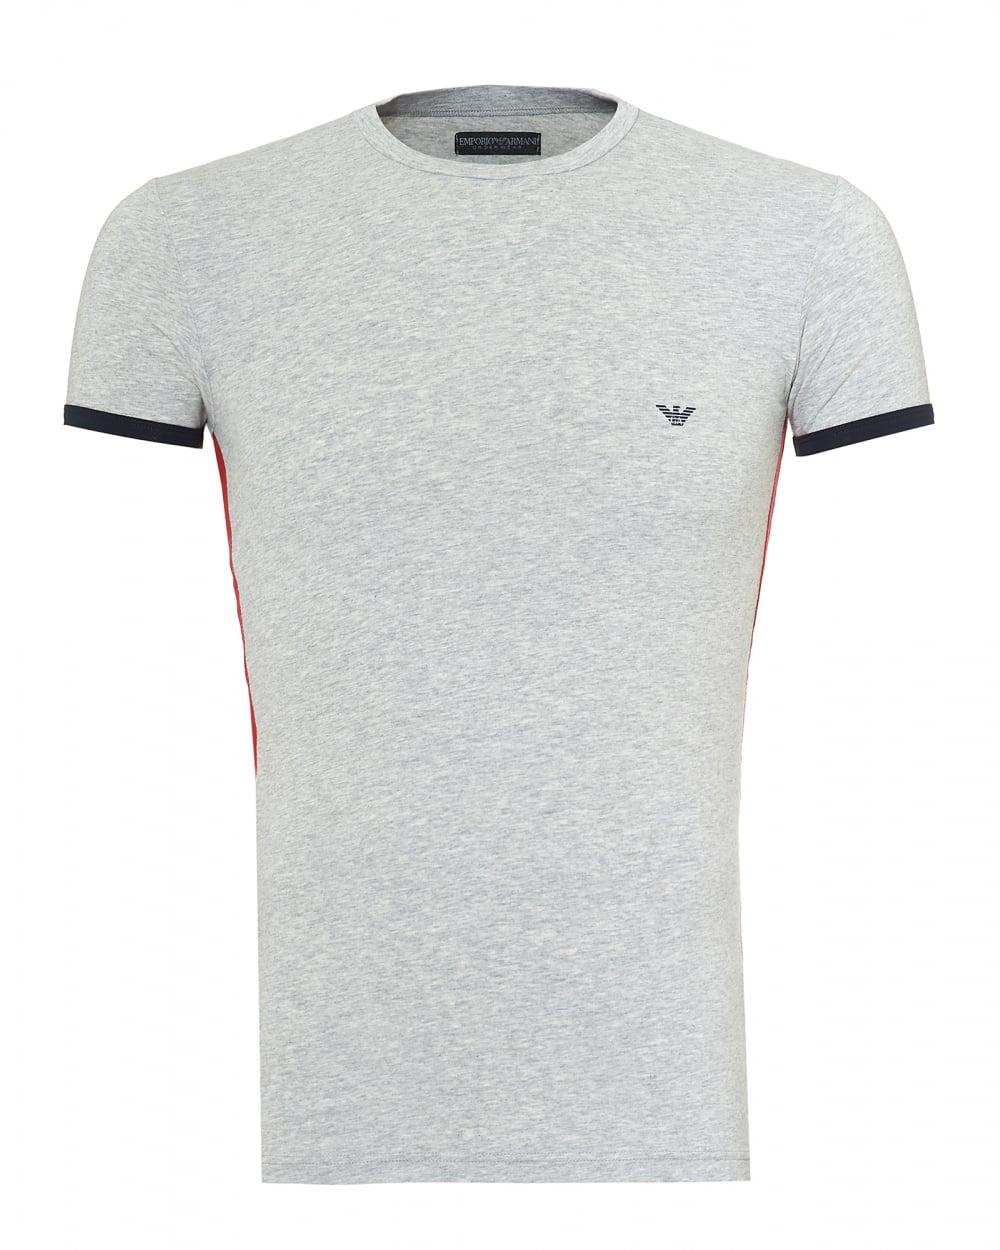 019ced70 Emporio Armani Mens Back Logo T-Shirt, Slim Fit Grey Tee